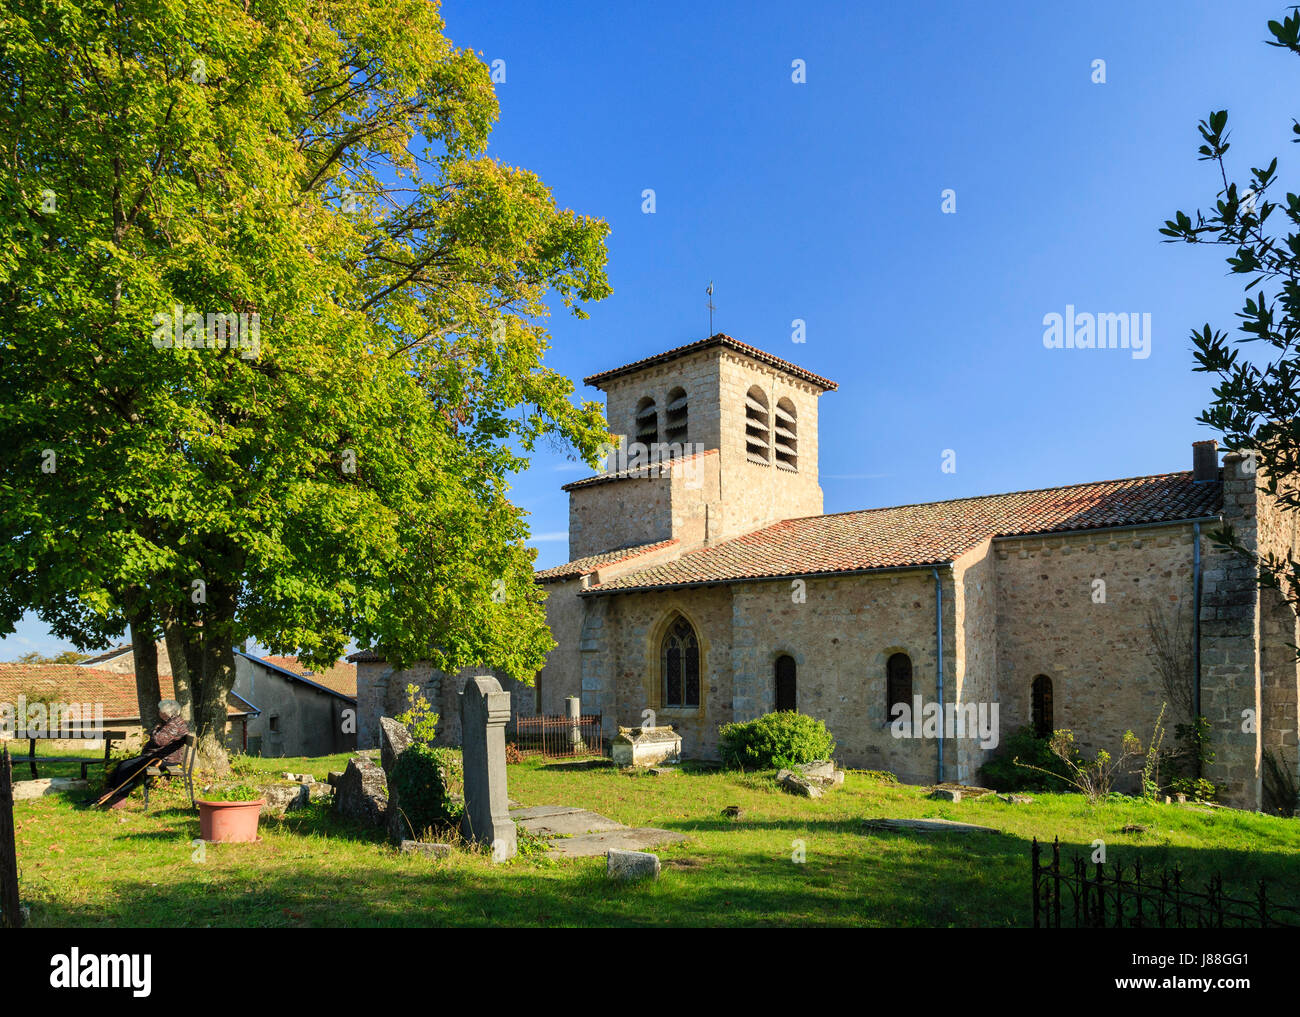 France, Loire, Saint-Haon-le-Chatel, the church Stock Photo